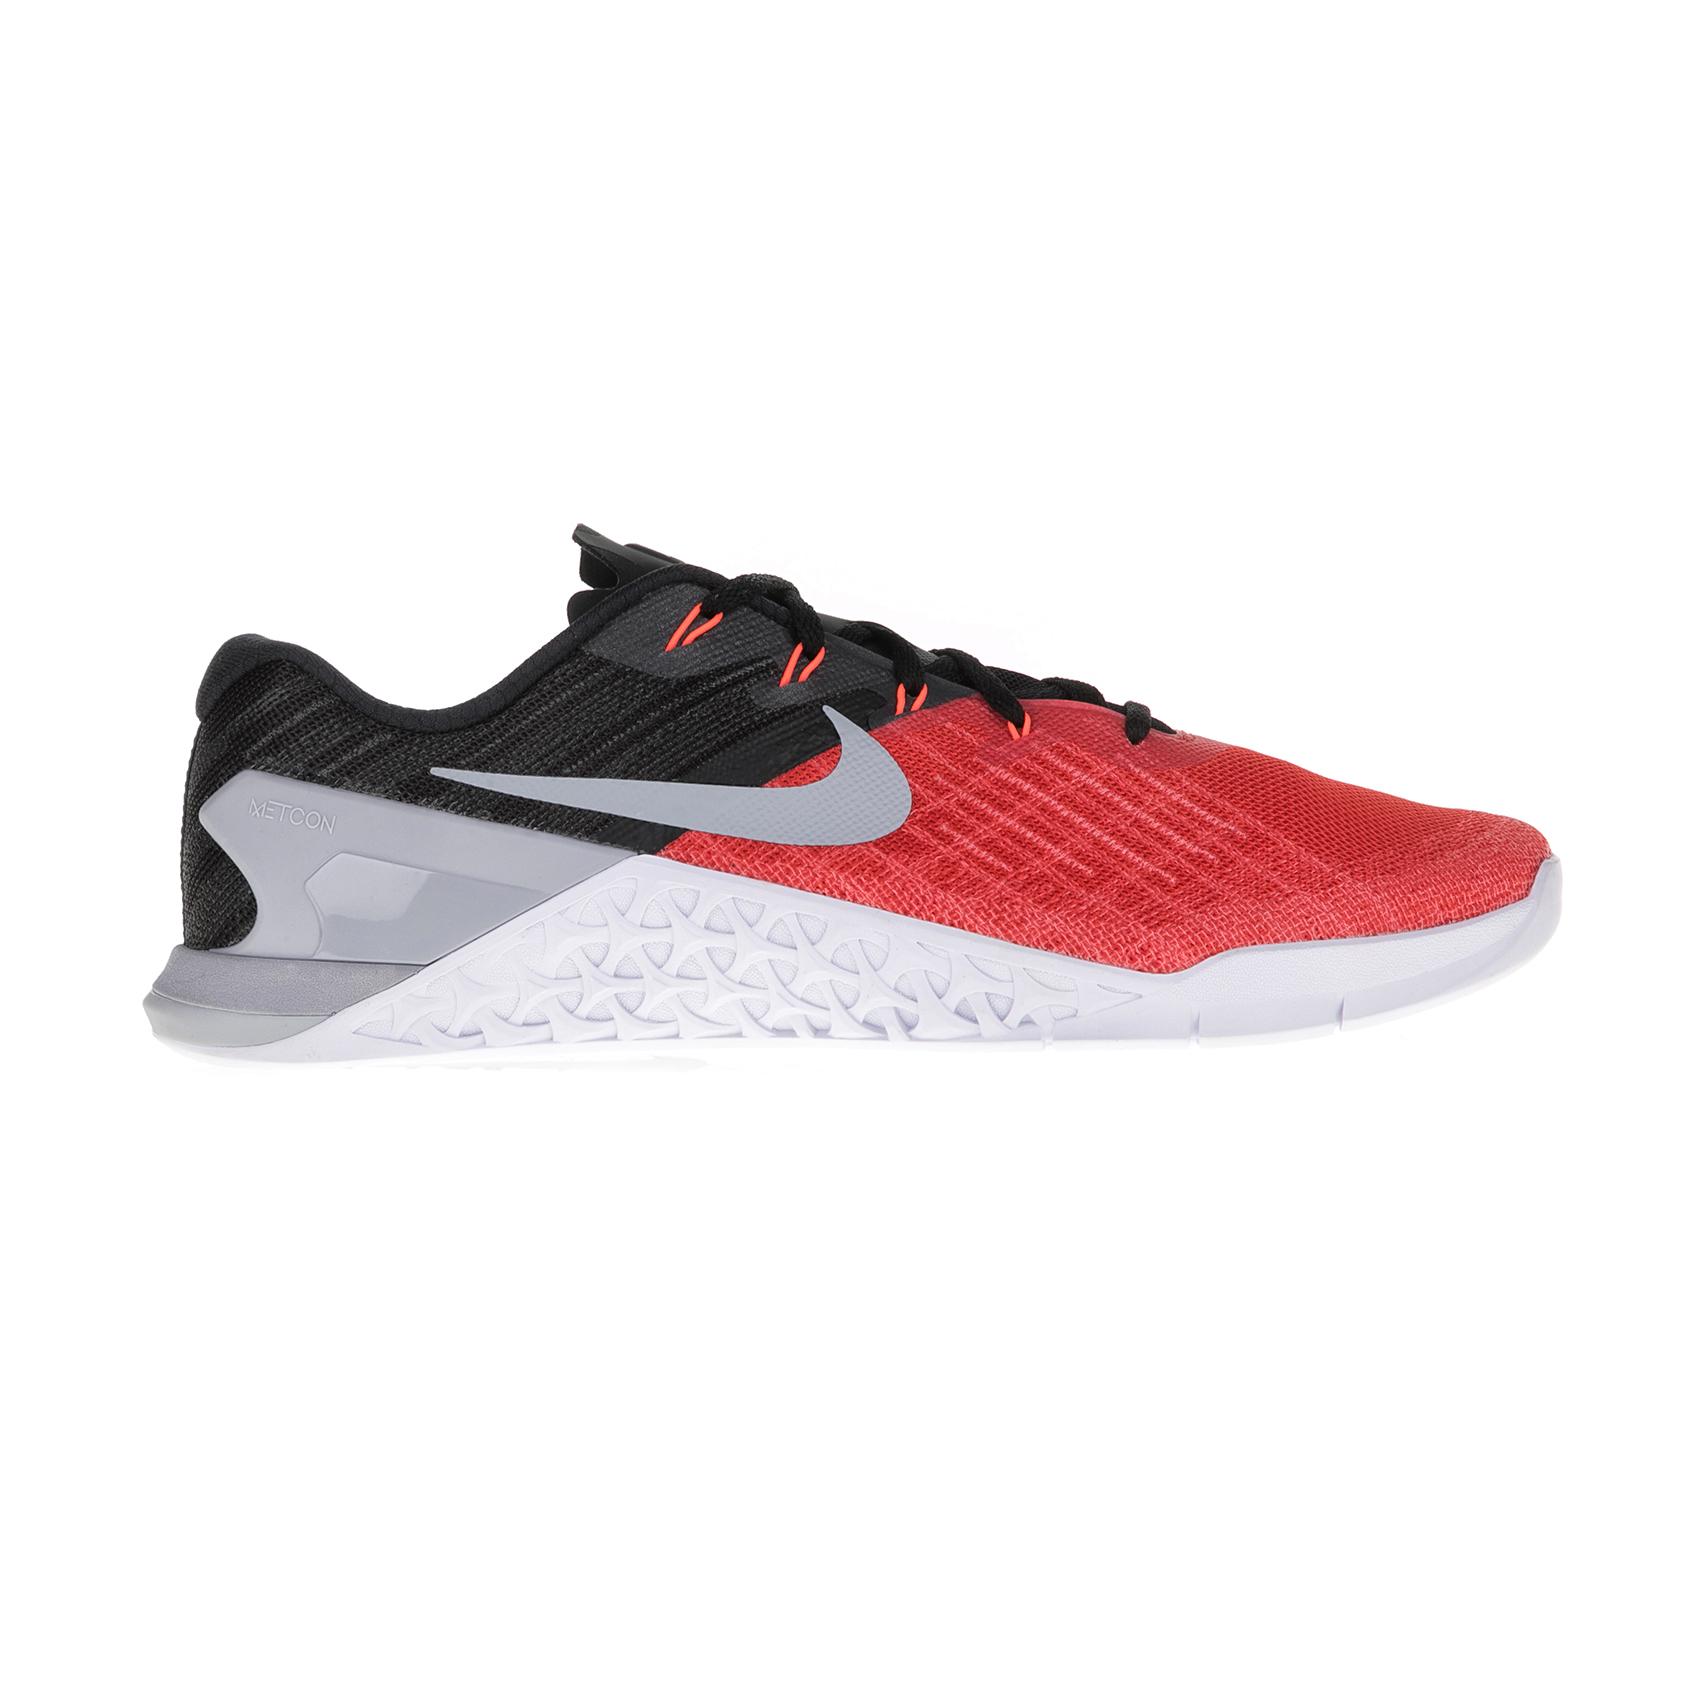 NIKE – Ανδρικά αθλητικά παπούτσια Nike METCON 3 κόκκινα – μαύρα